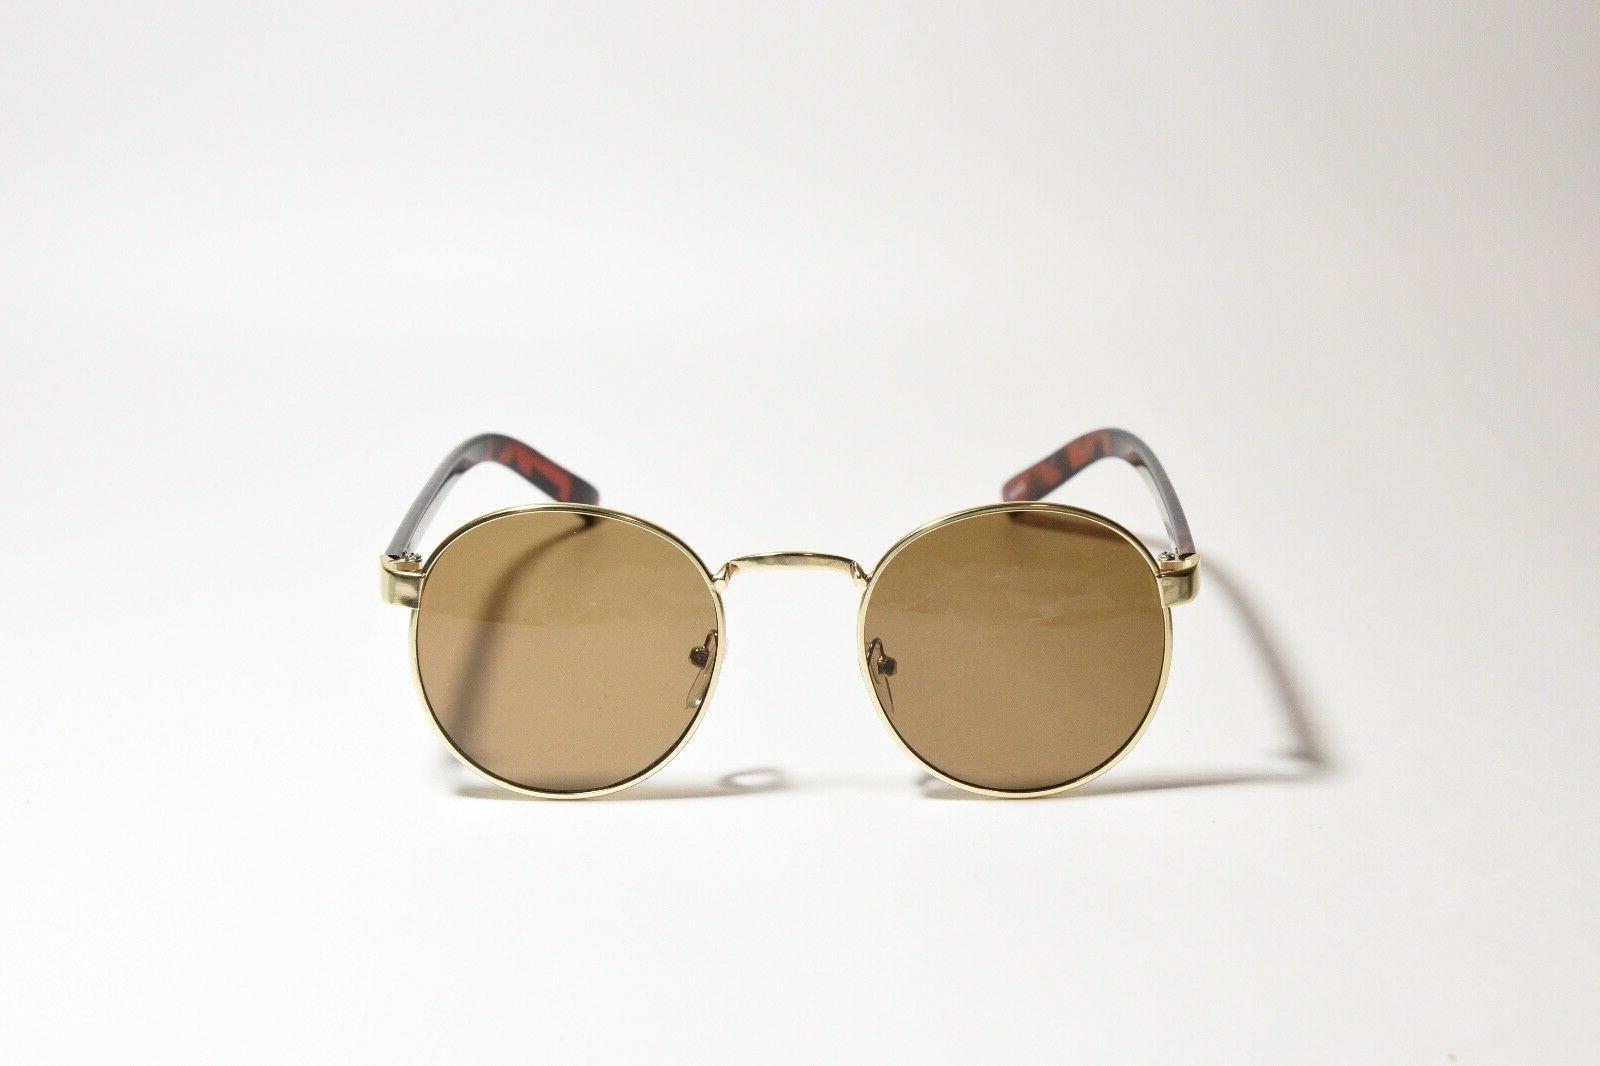 round metal plastic frame sunglasses gold tortoise